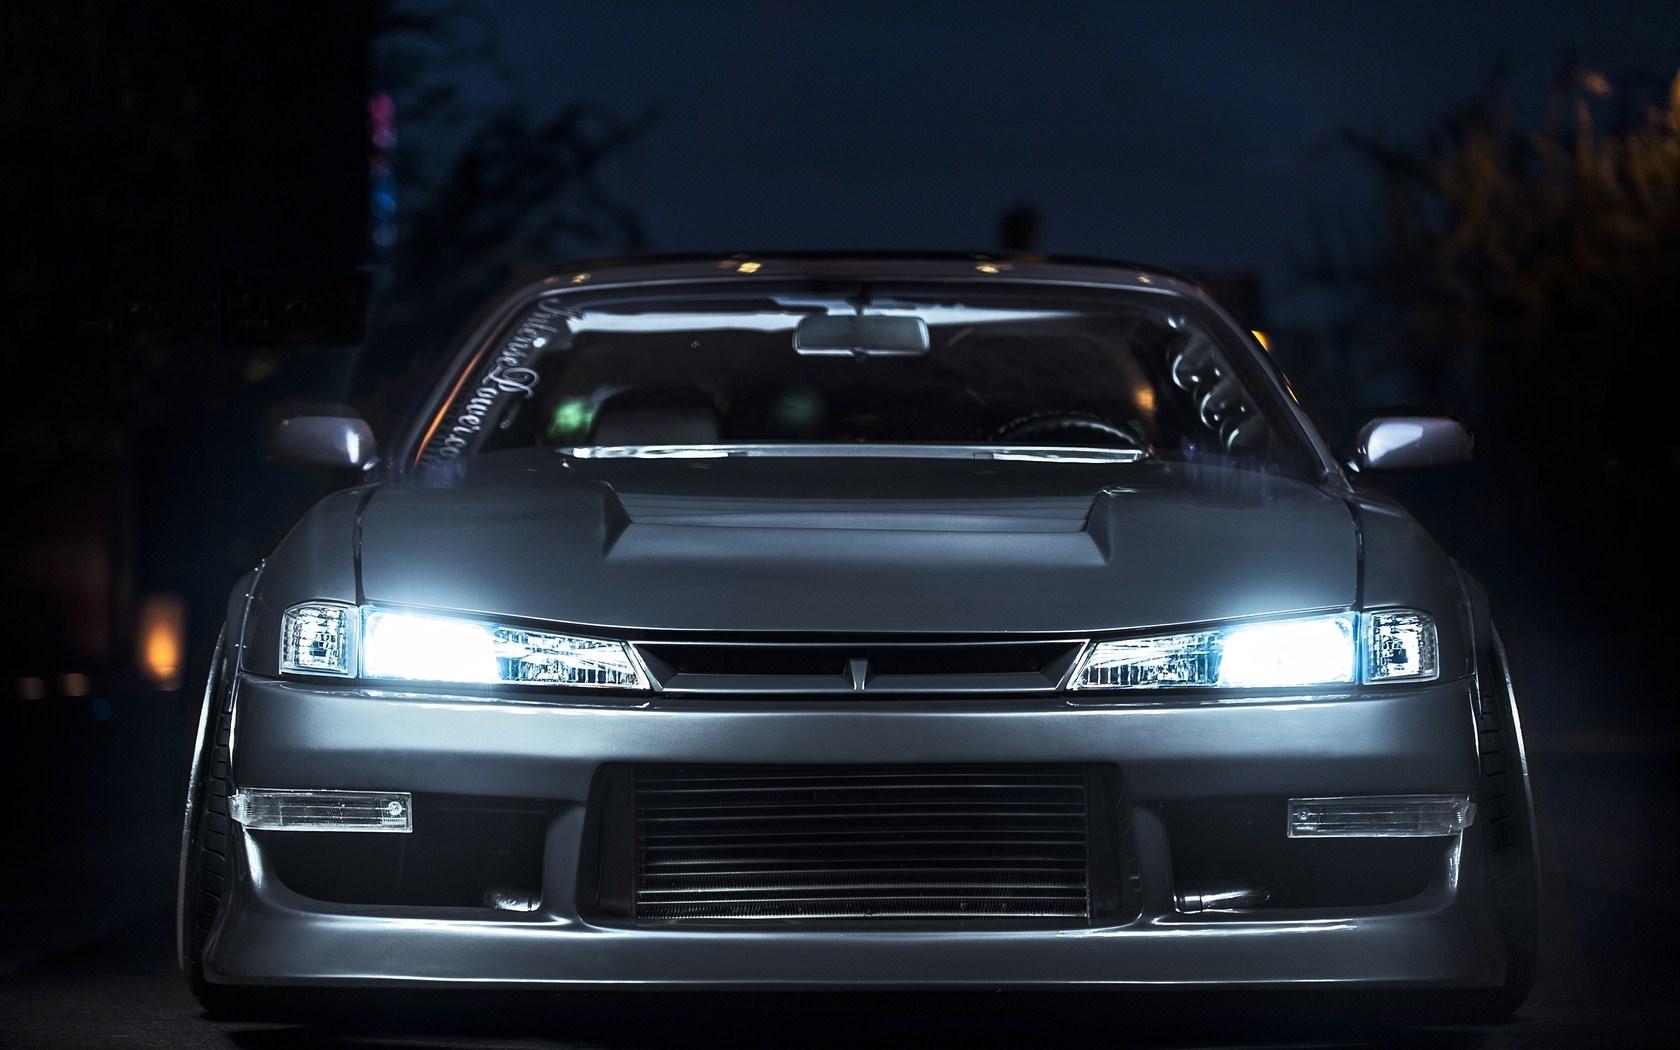 Nissan Silvia S14 Lights Night